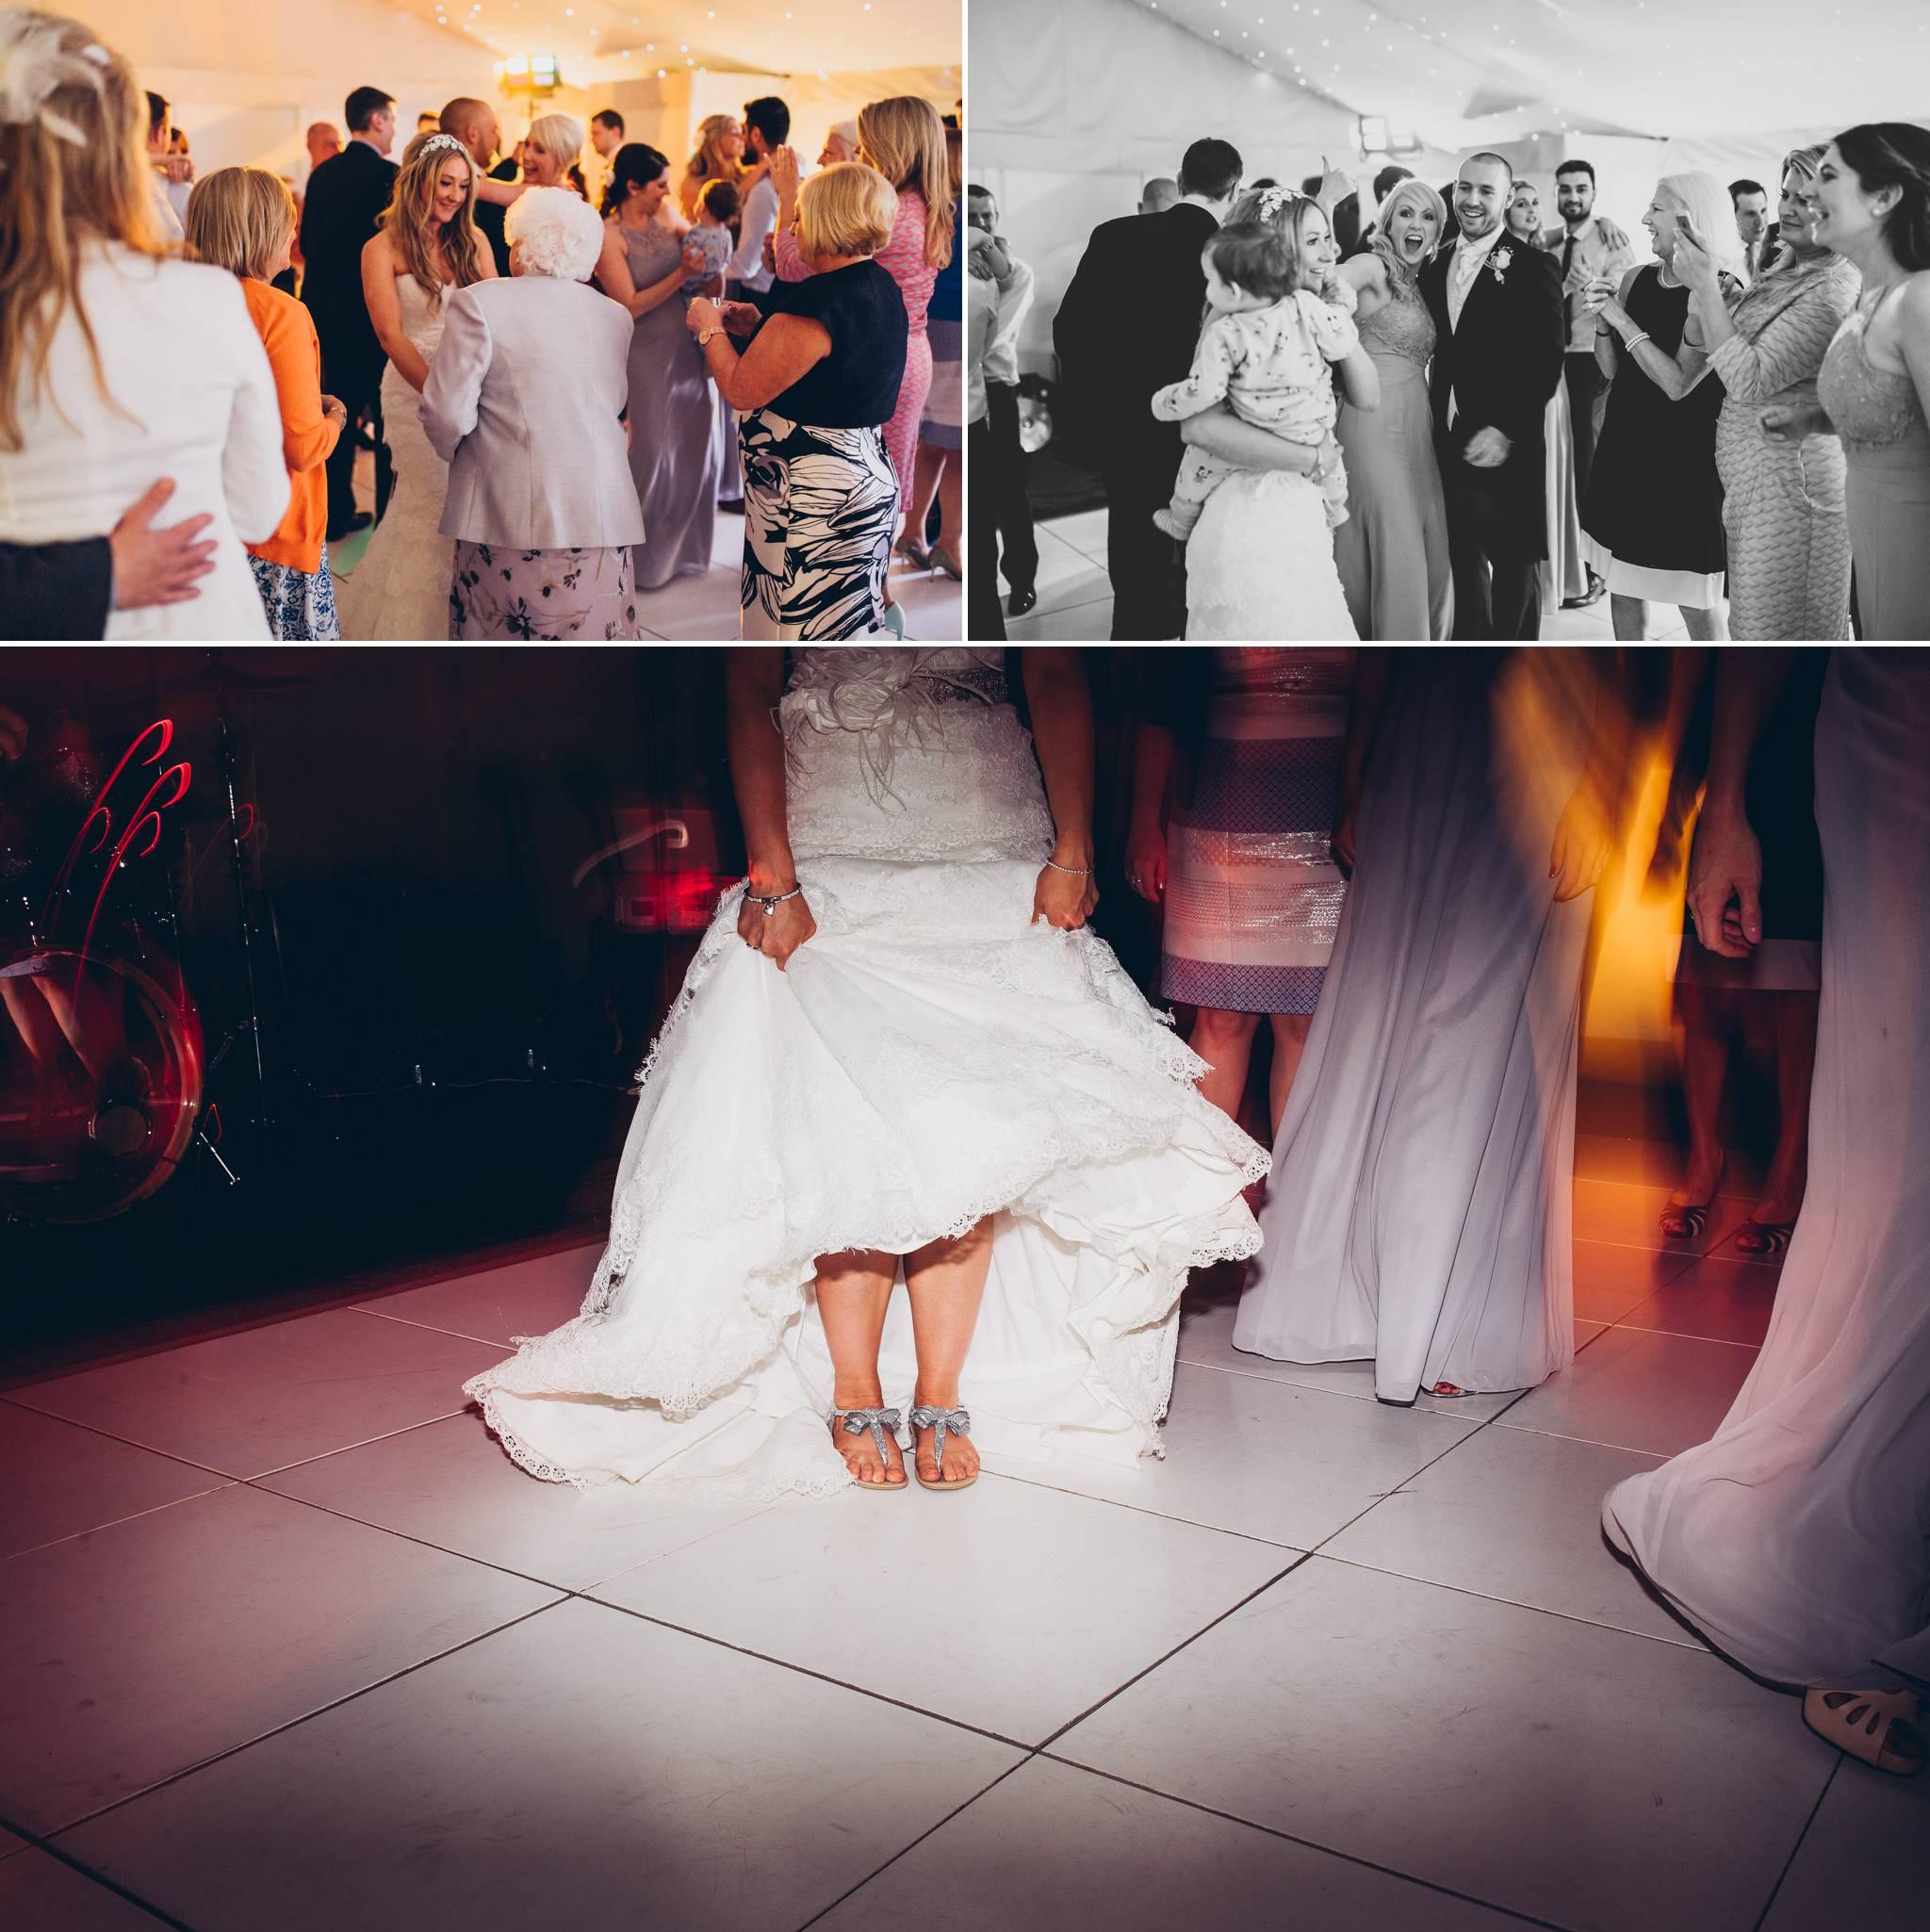 shropshire-wedding-photography 37.jpg